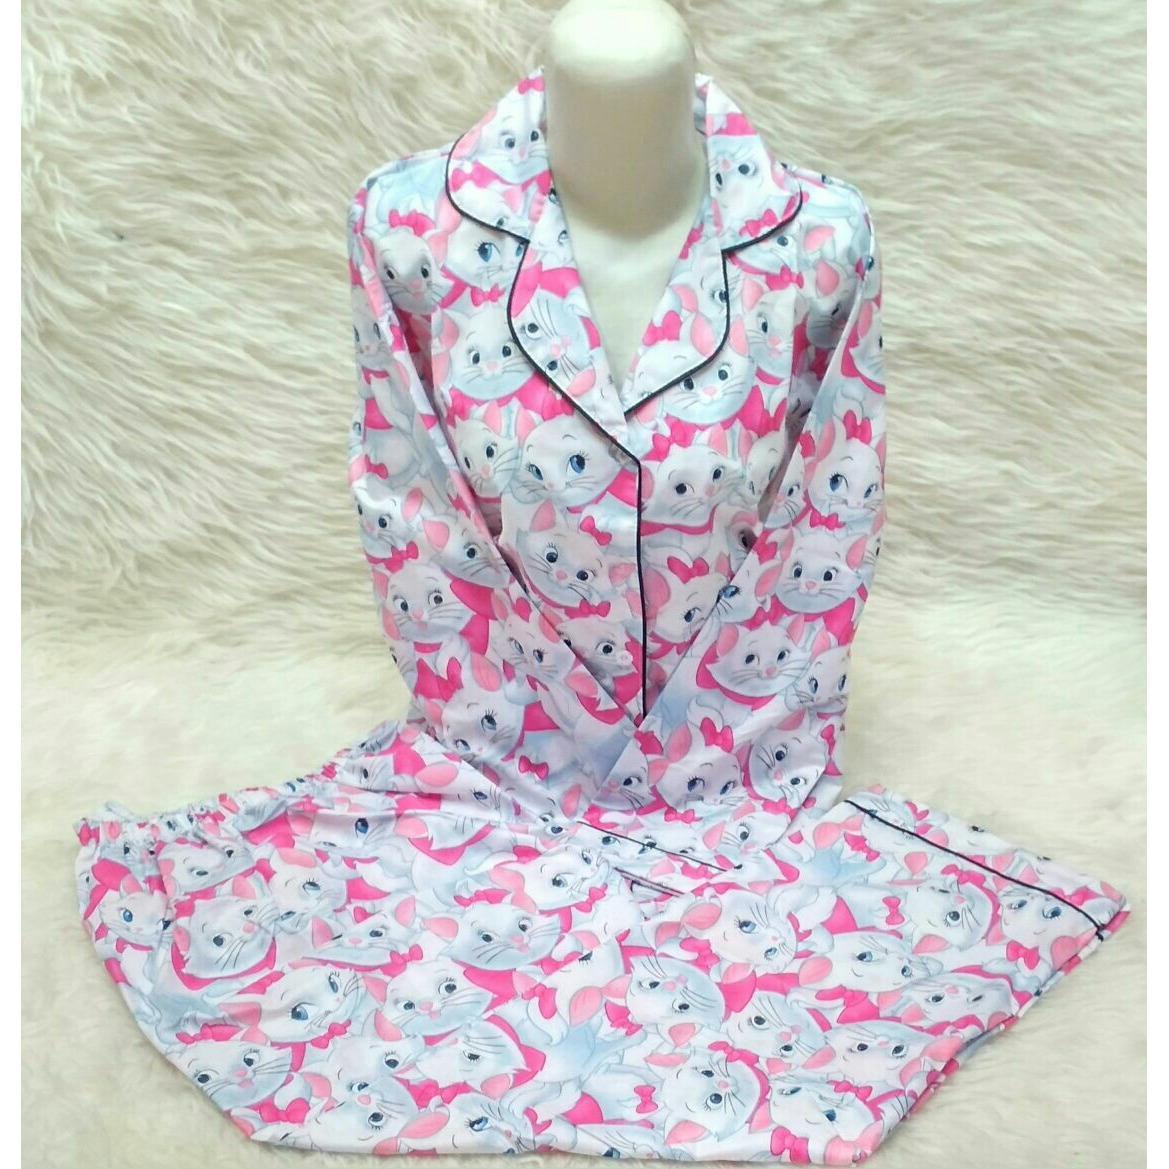 Jual Lunashop Fashion Wanita Model Baju Tidur Corak Gambar Panjang Lunashop Online